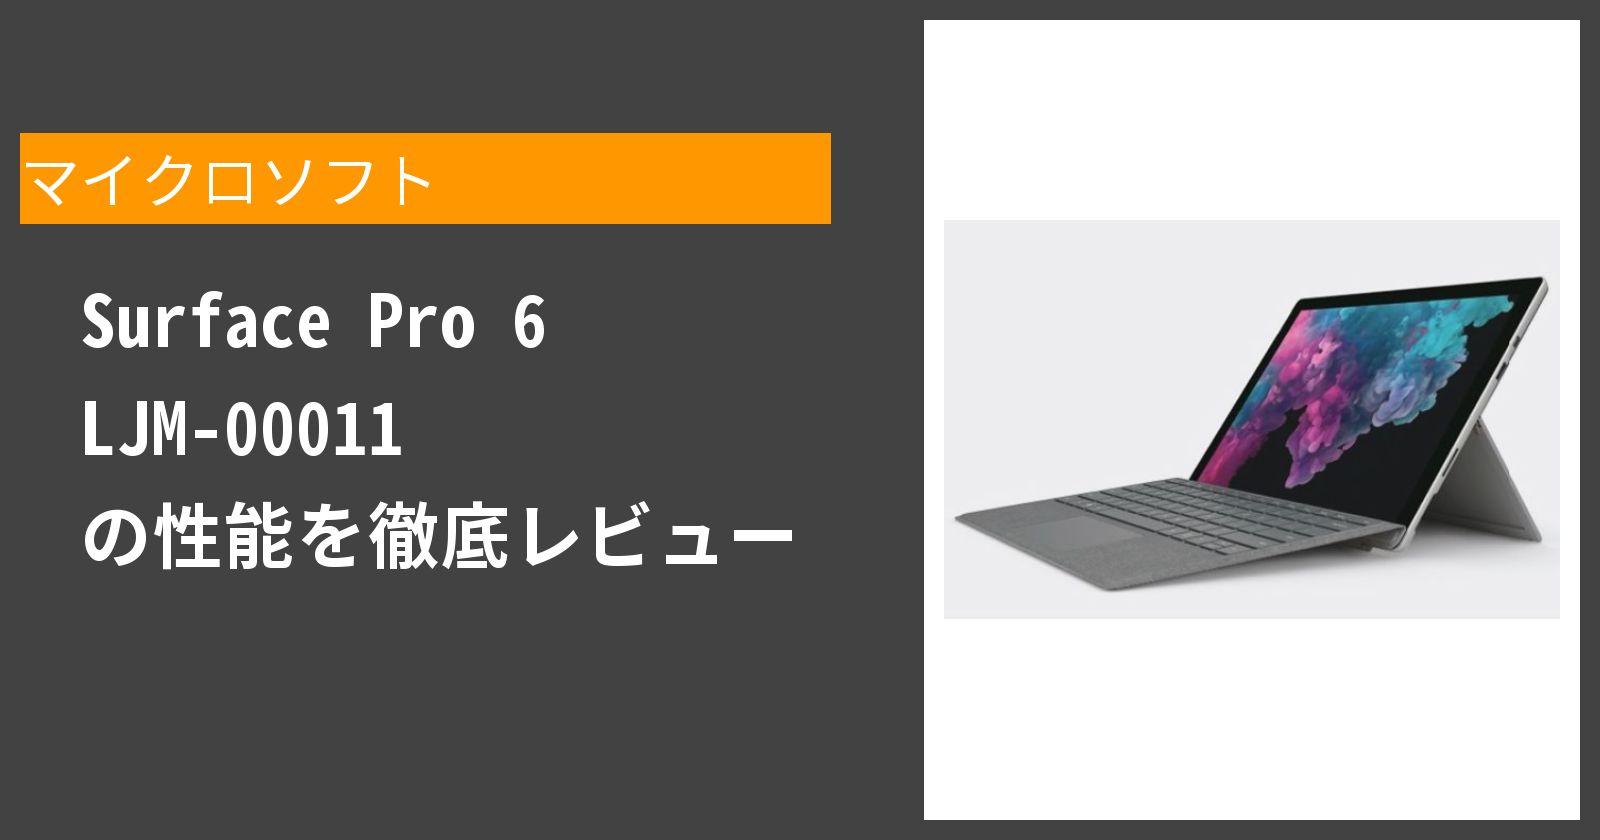 Surface Pro 6 LJM-00011 の性能を徹底レビュー